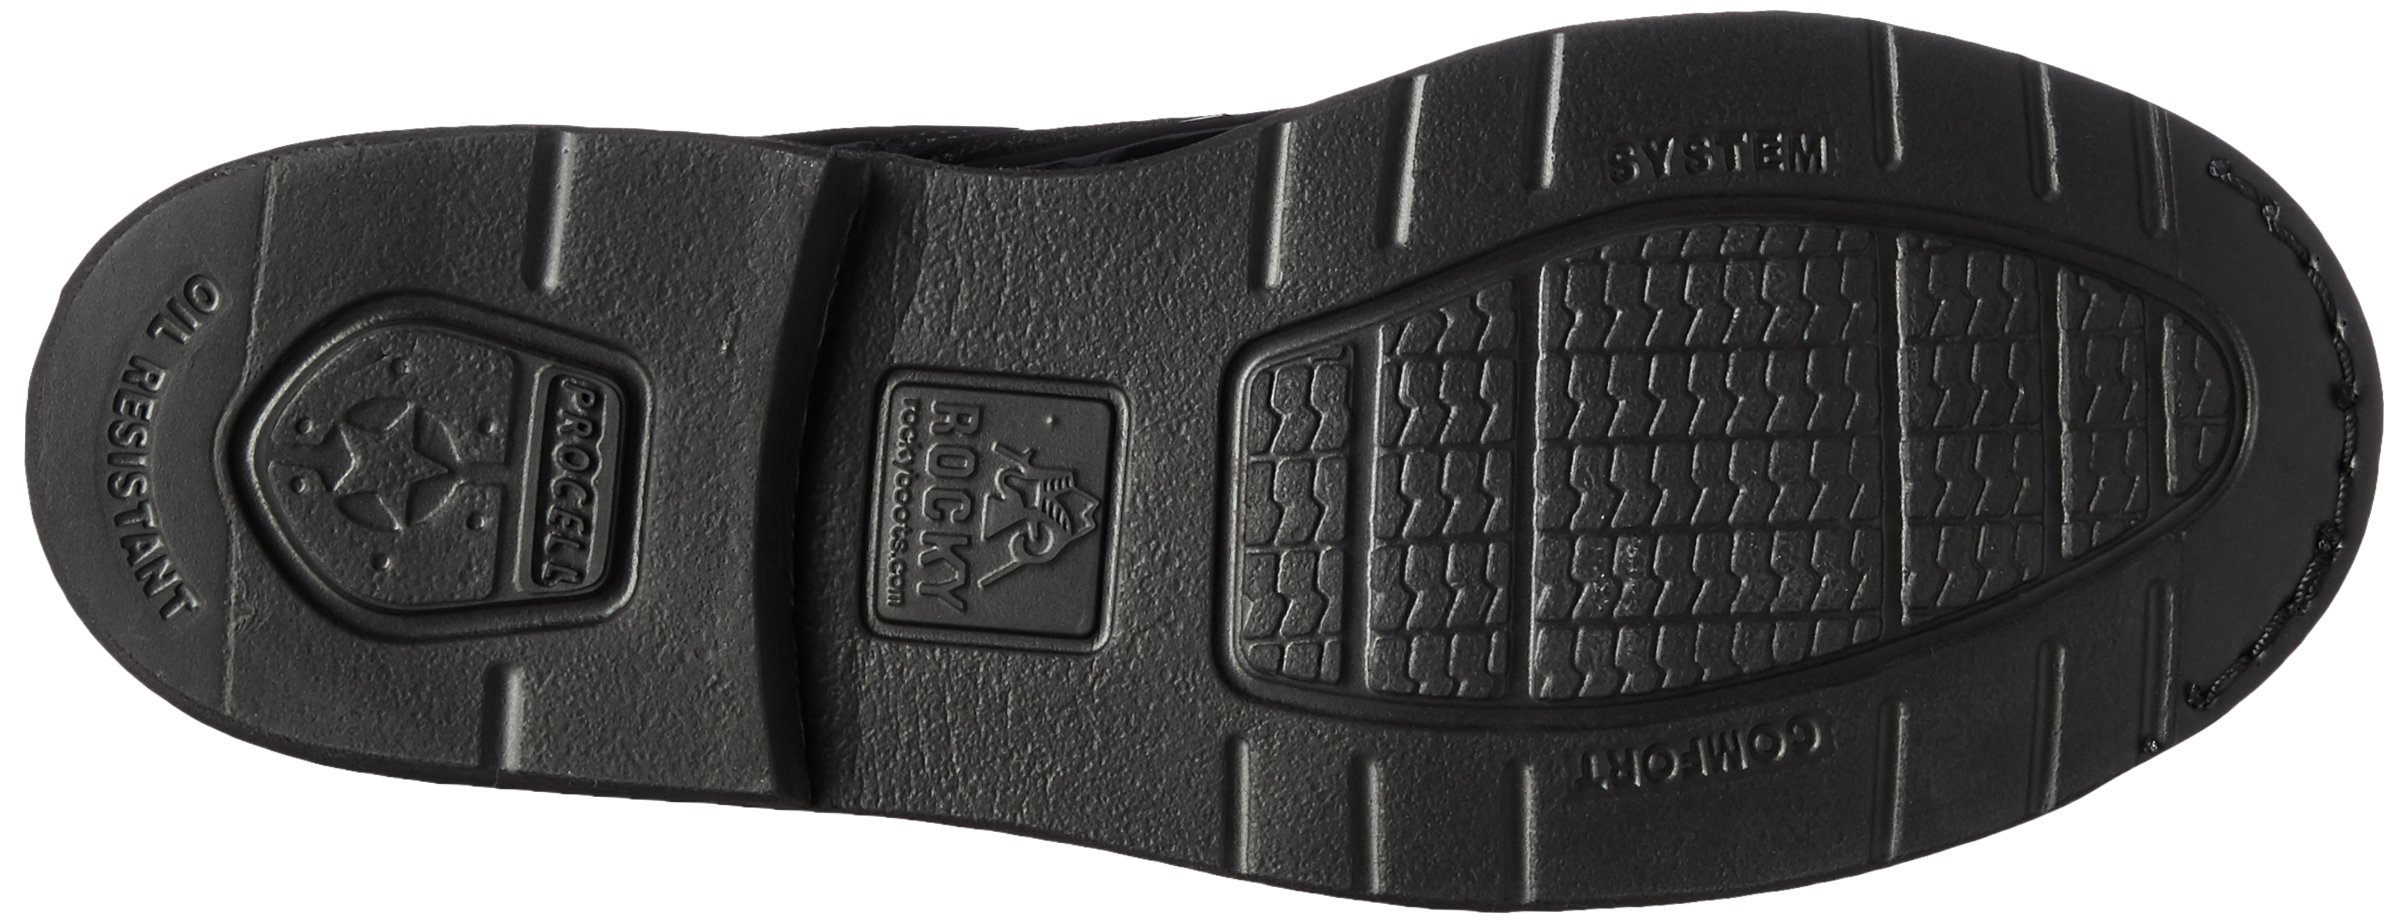 Rocky Men's 6 Inch Professional Dress 500-8 Work Boot,Black,10 XW US by Rocky (Image #3)